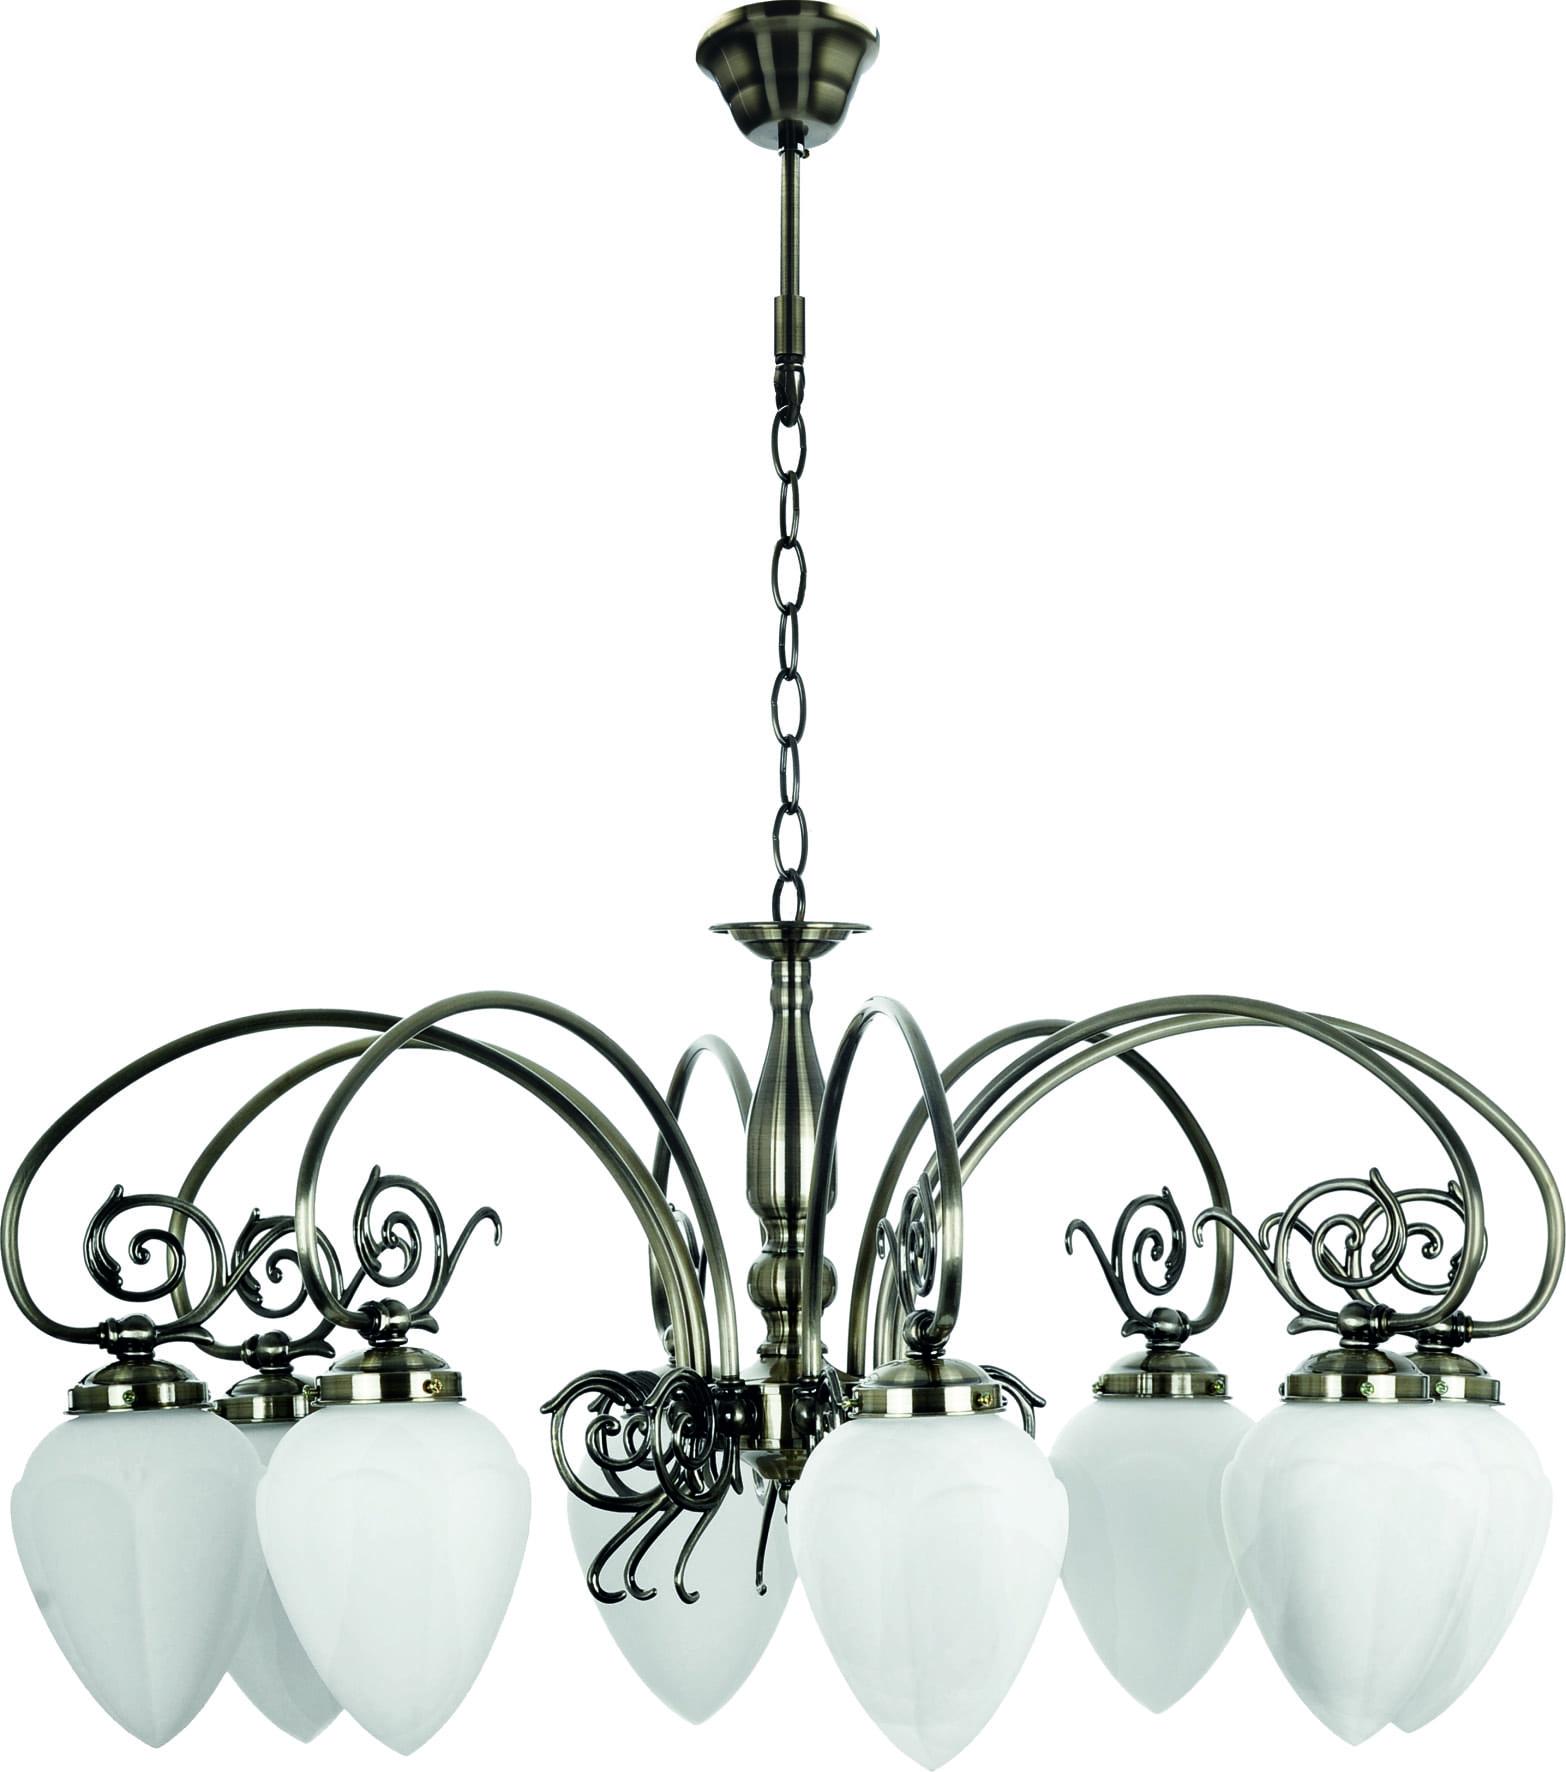 Eight-point chandelier Bossa patina / white E14 60W